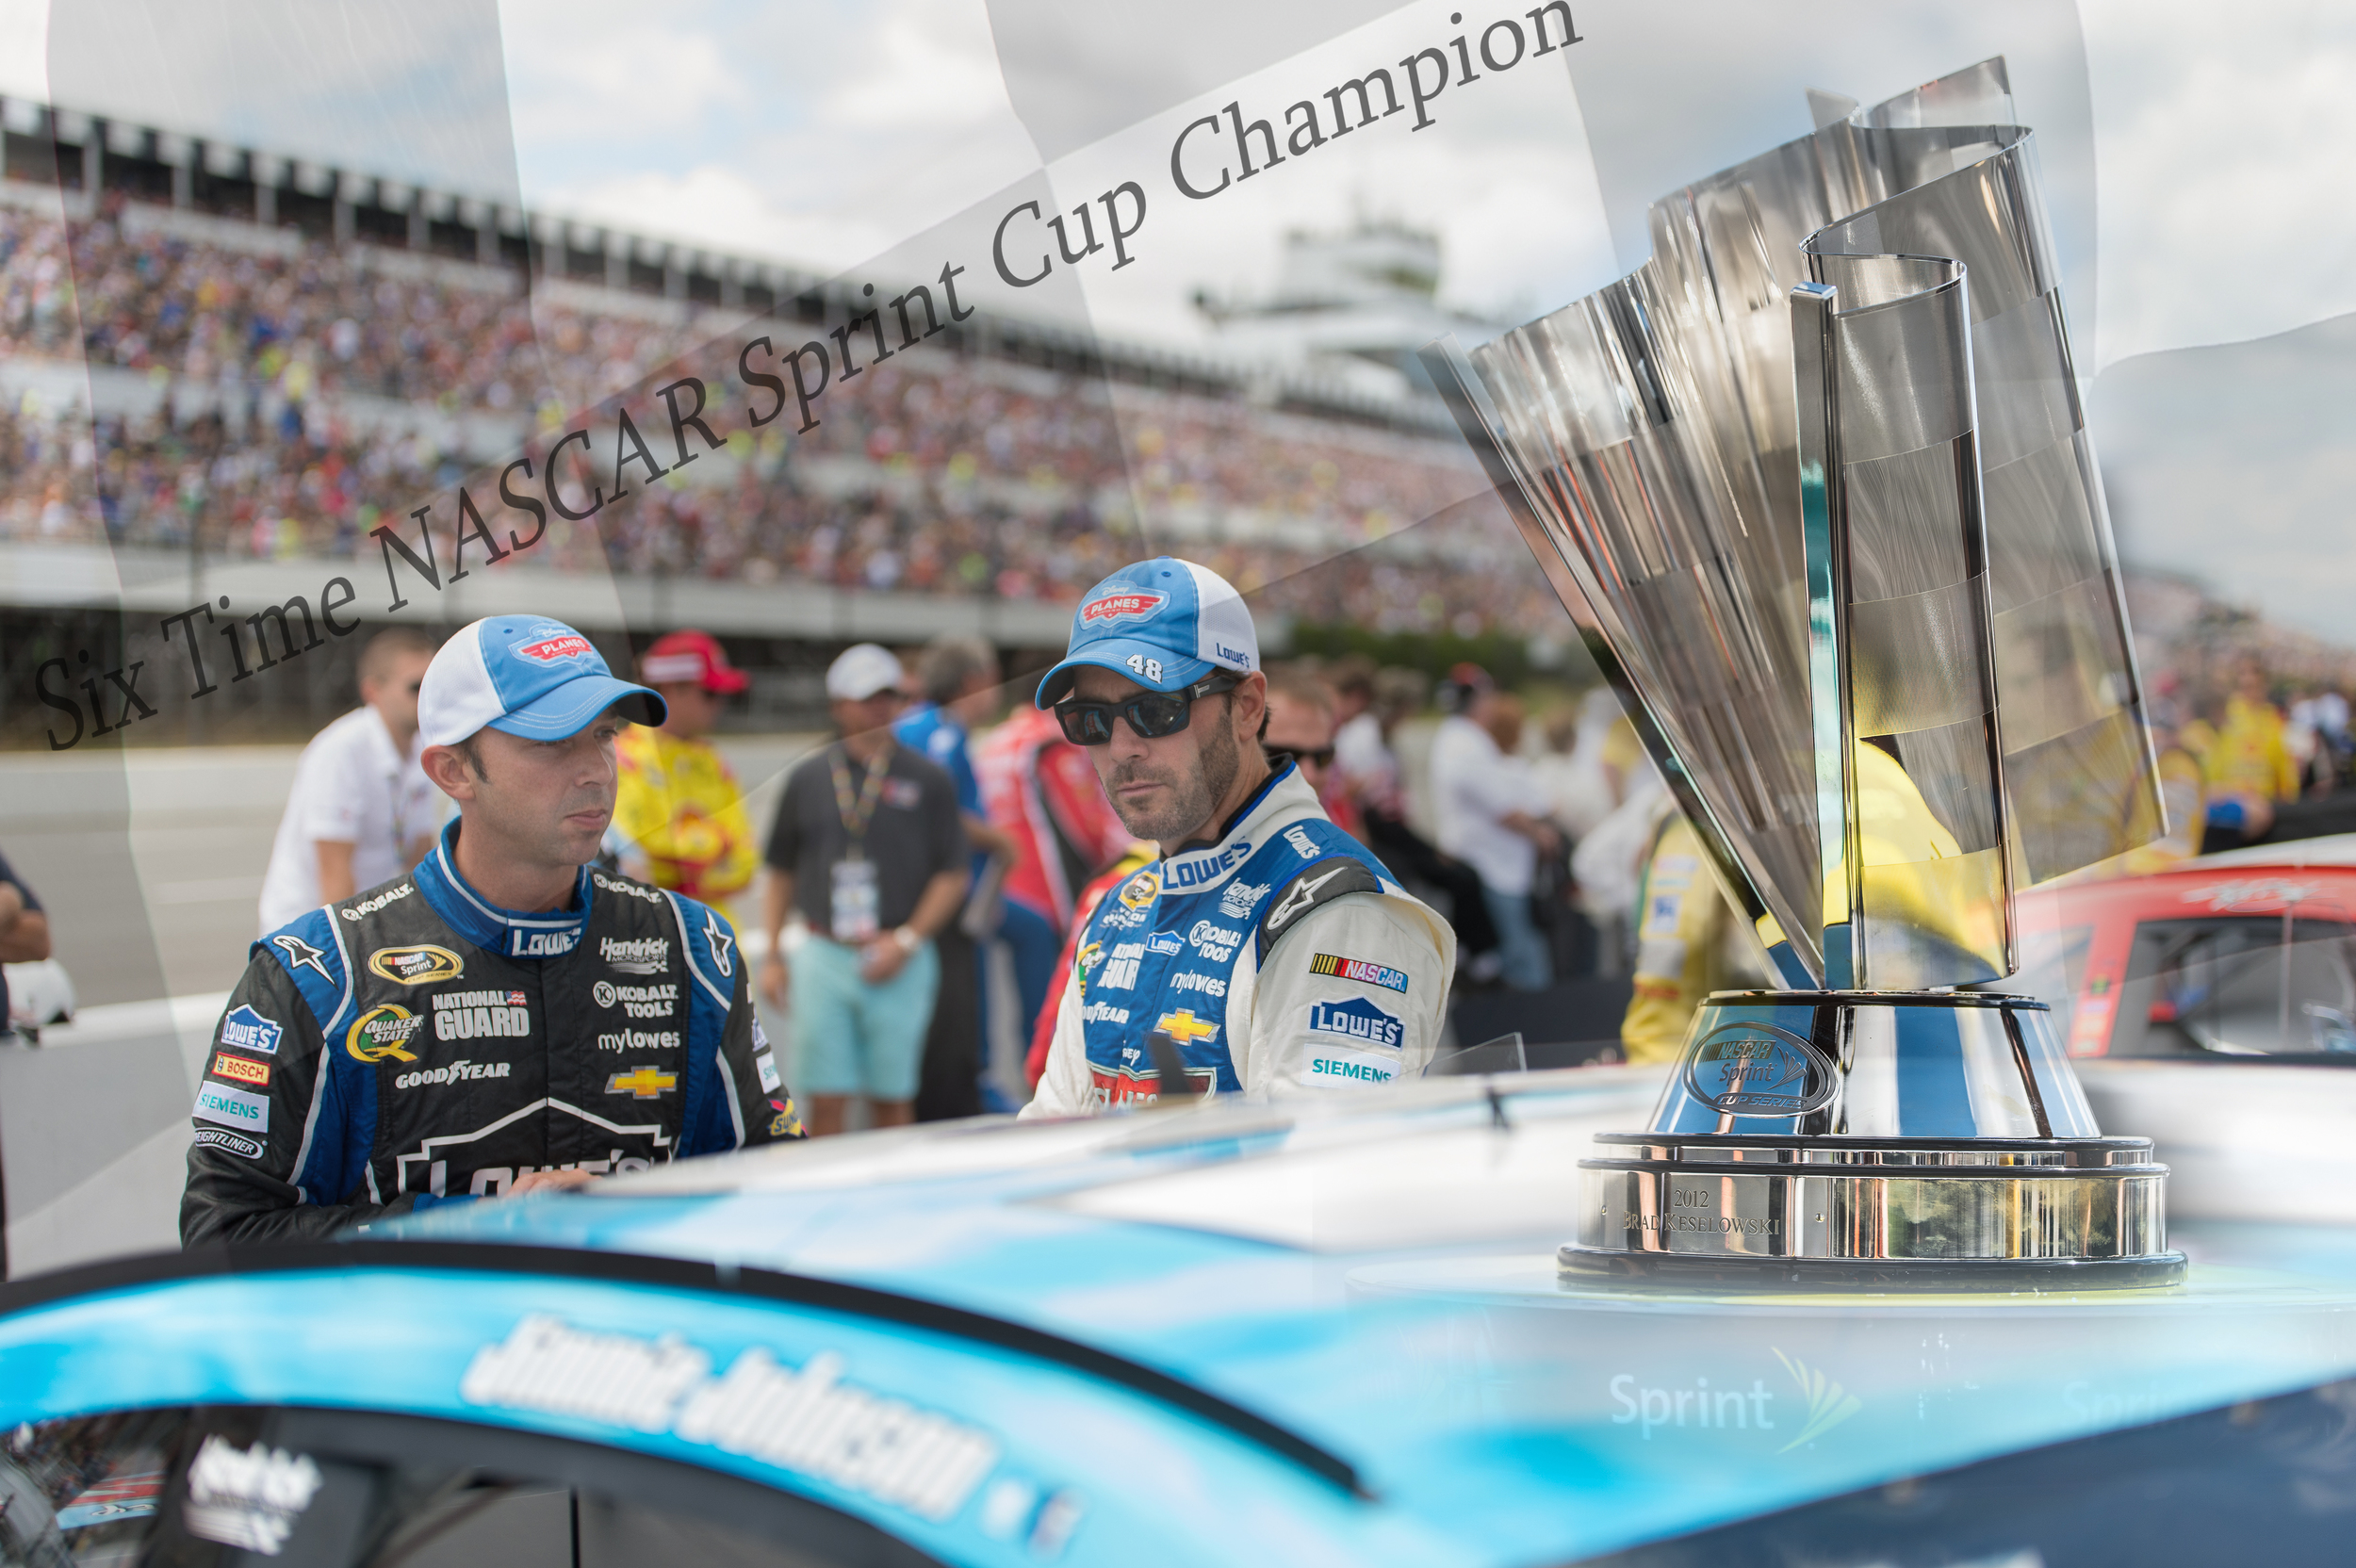 JJ Champion tribute.jpg